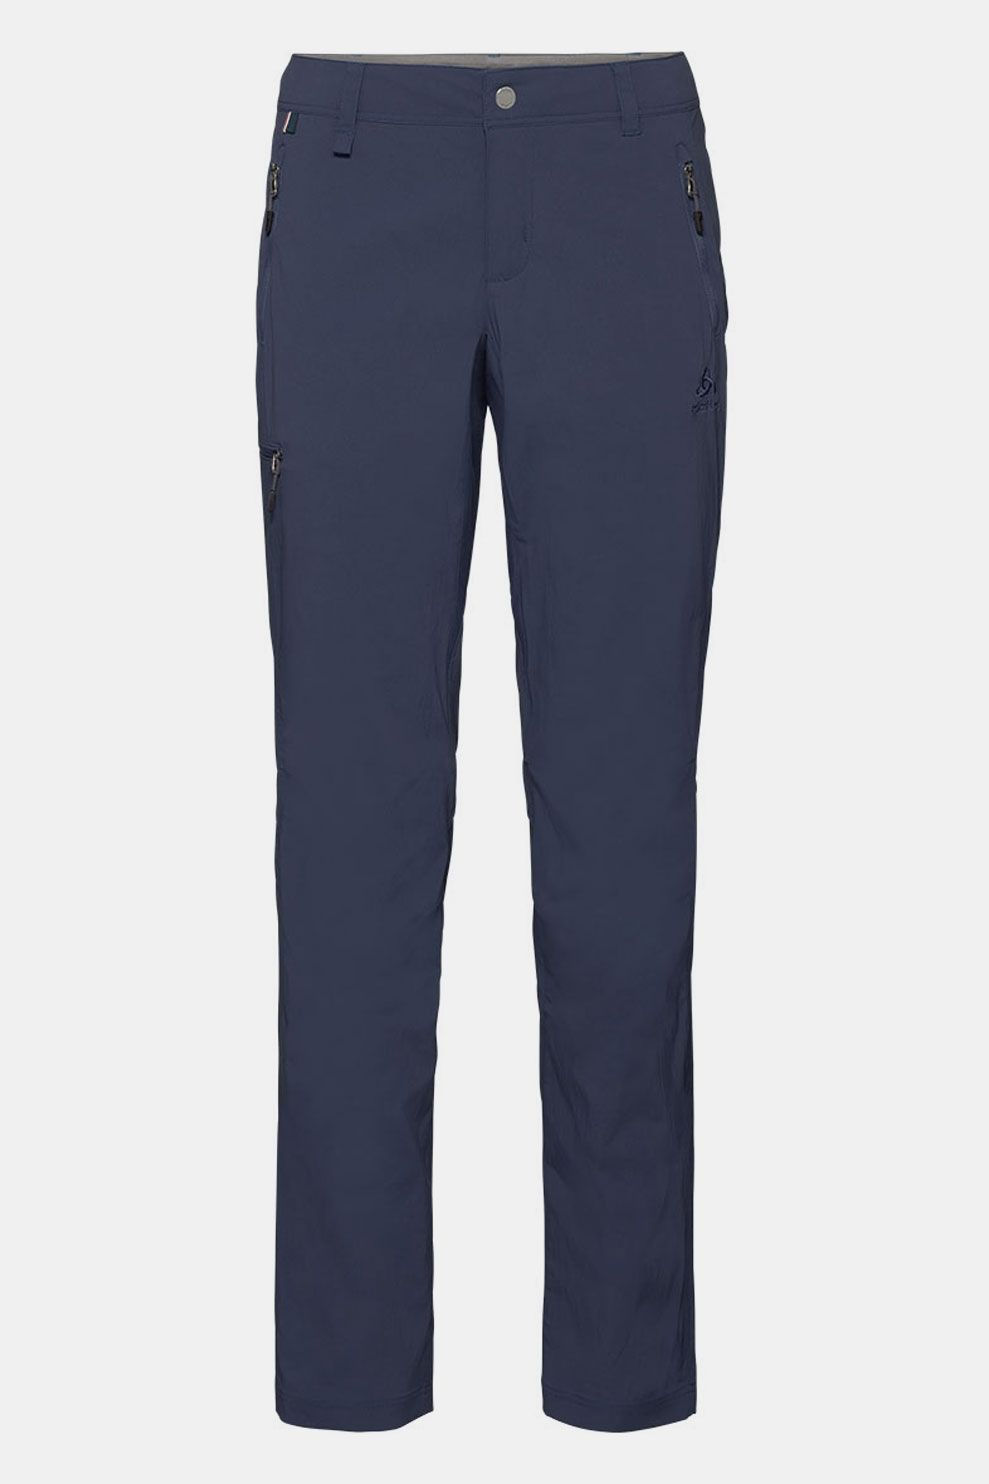 Odlo Pants Wedgemount Broek Dames Donkerblauw Marineblauw